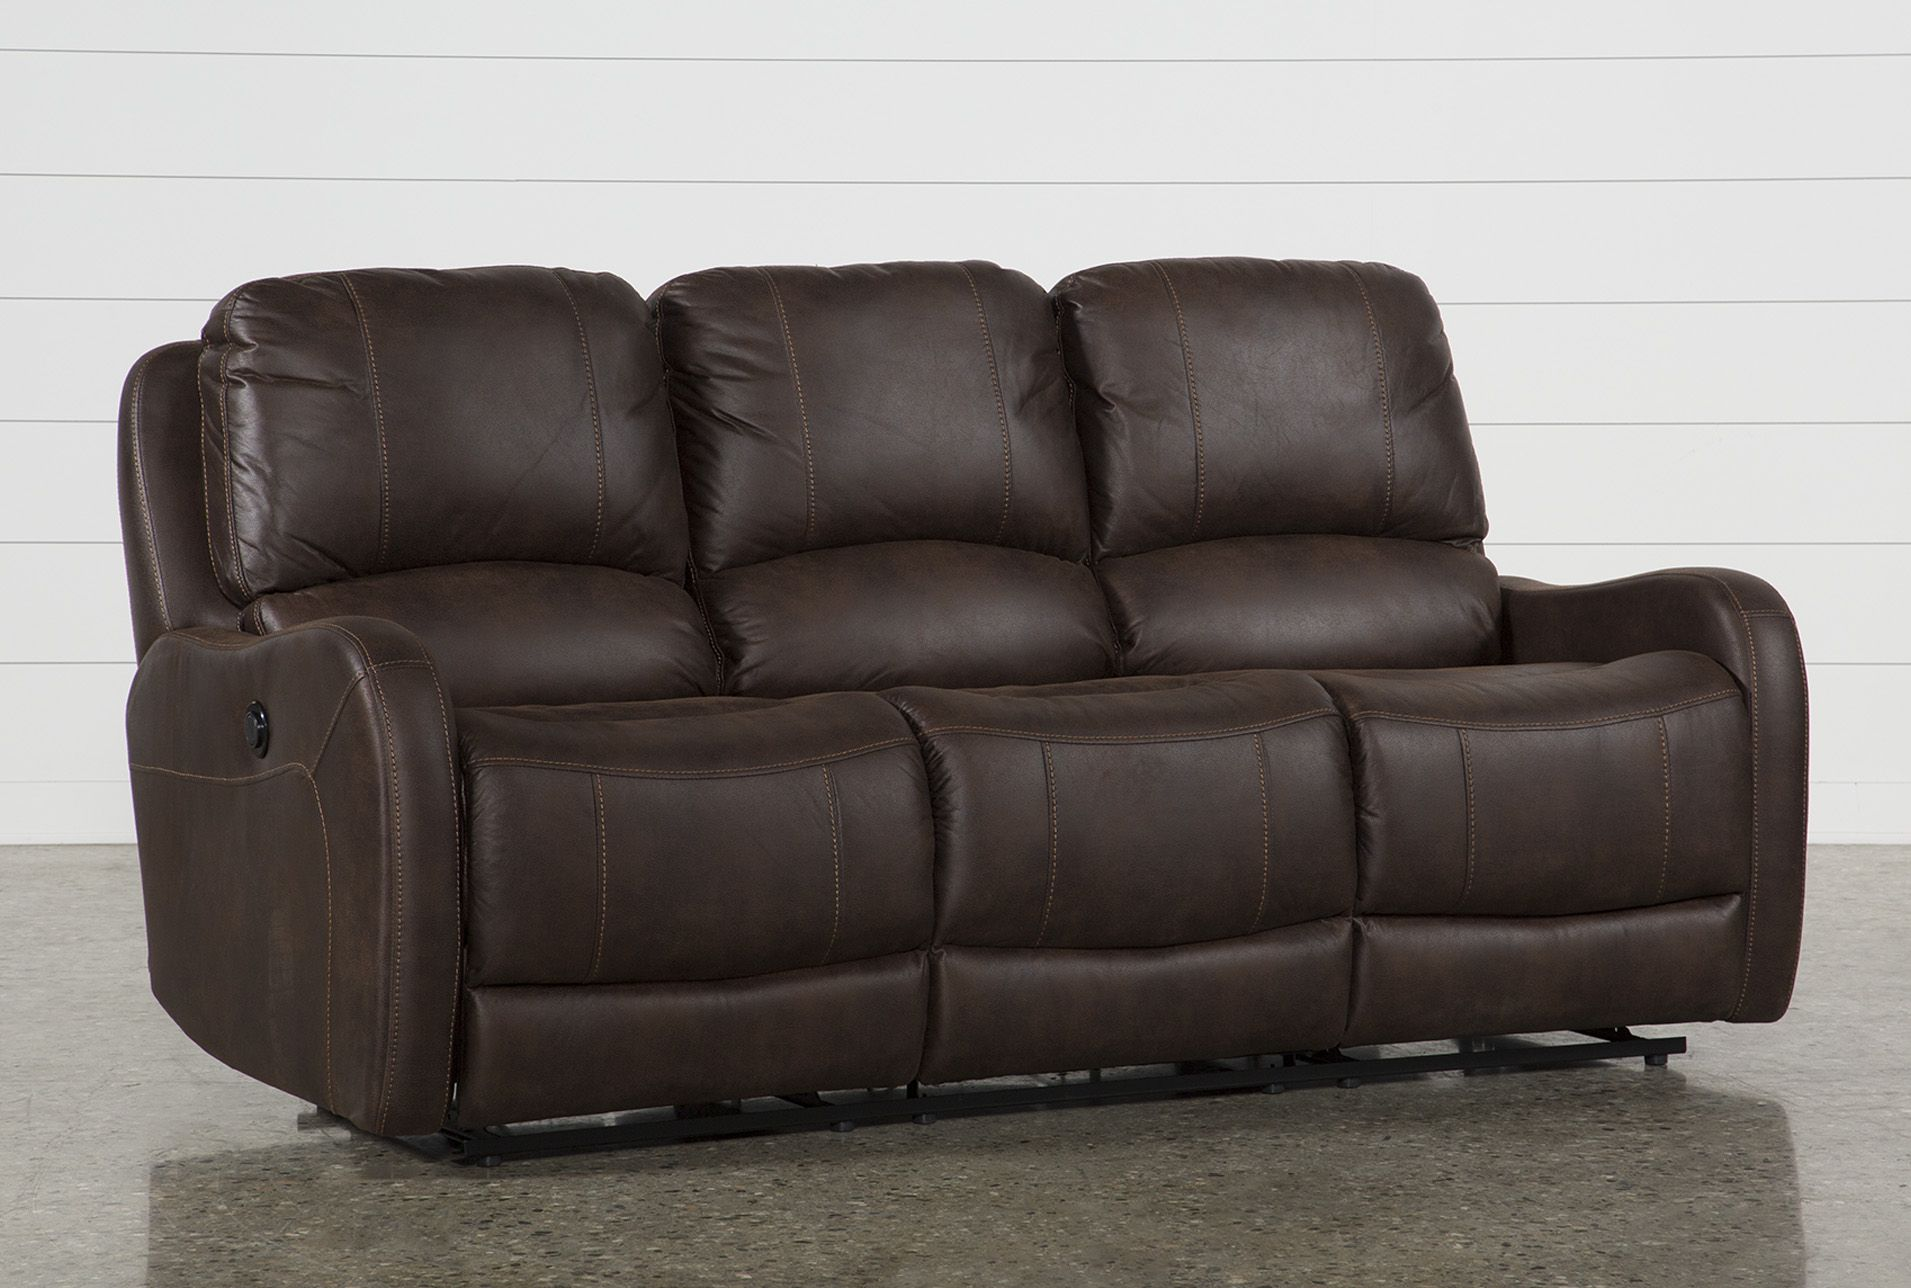 Davor Brown Power Reclining Sofa Power Reclining Sofa Power Reclining Loveseat Discount Living Room Furniture